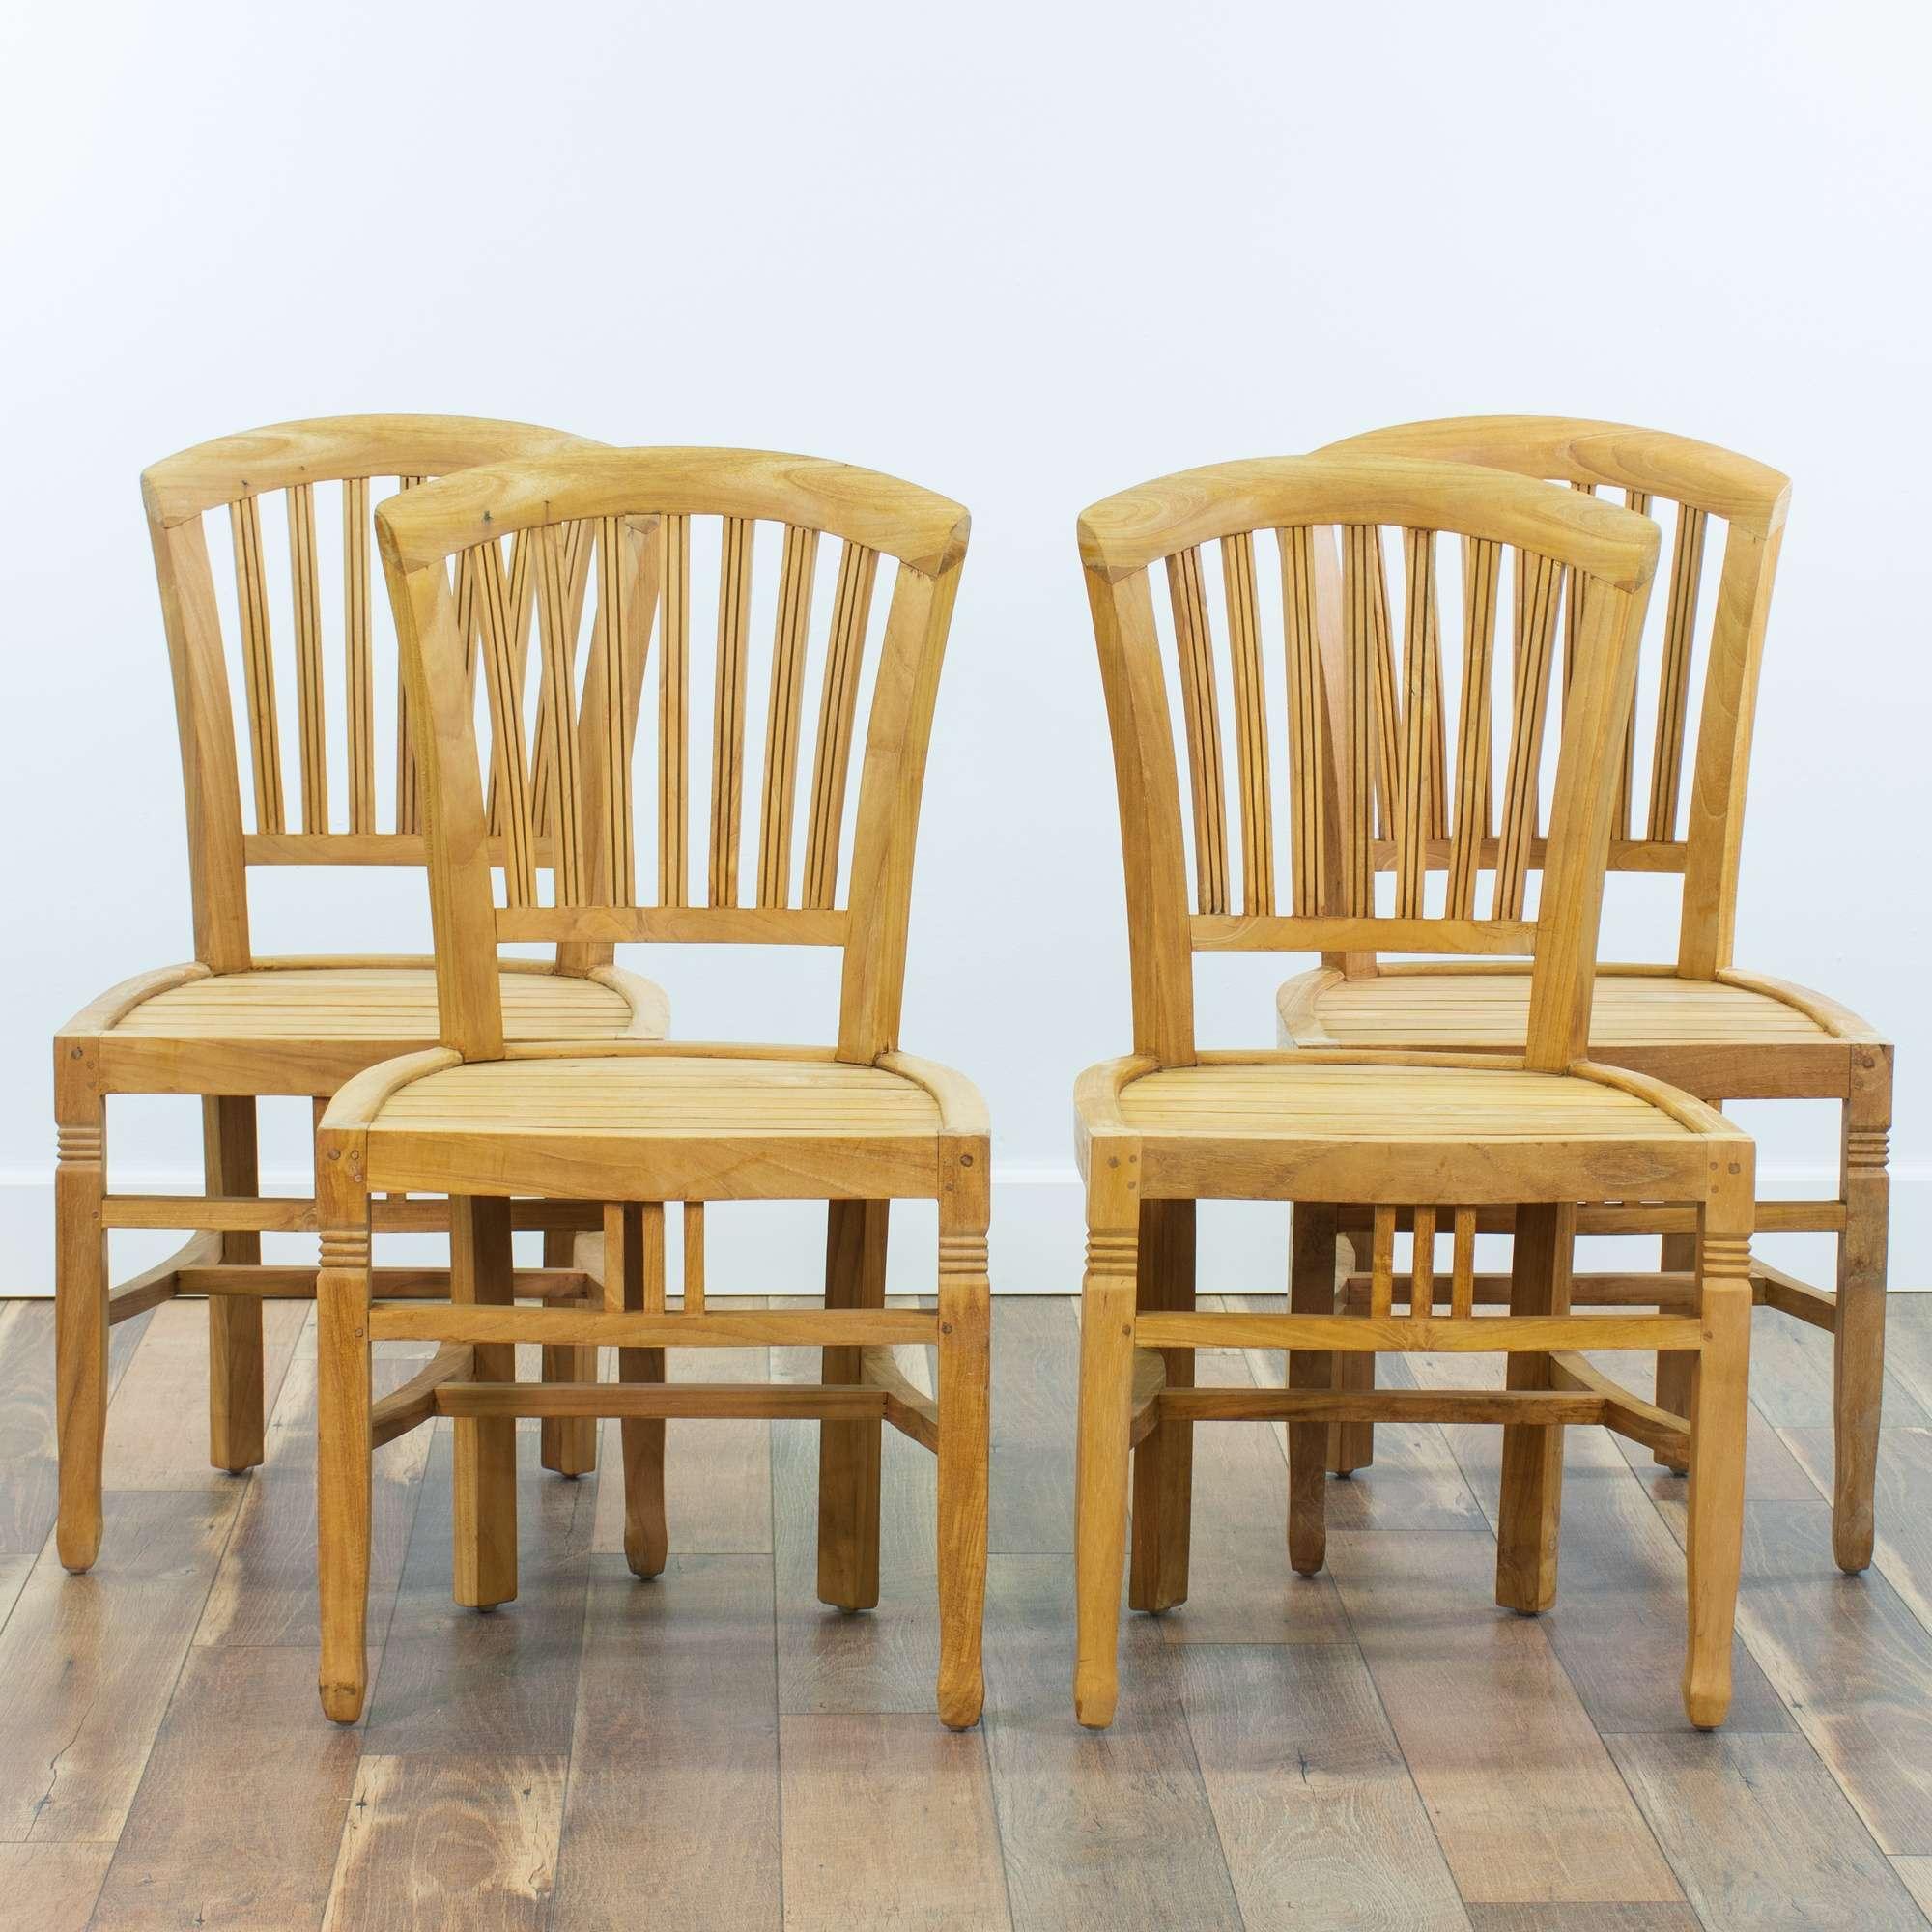 Teak Patio Furniture Los Angeles.Set Of 4 Chic Teak Patio Chairs Loveseat Vintage Furniture San Diego